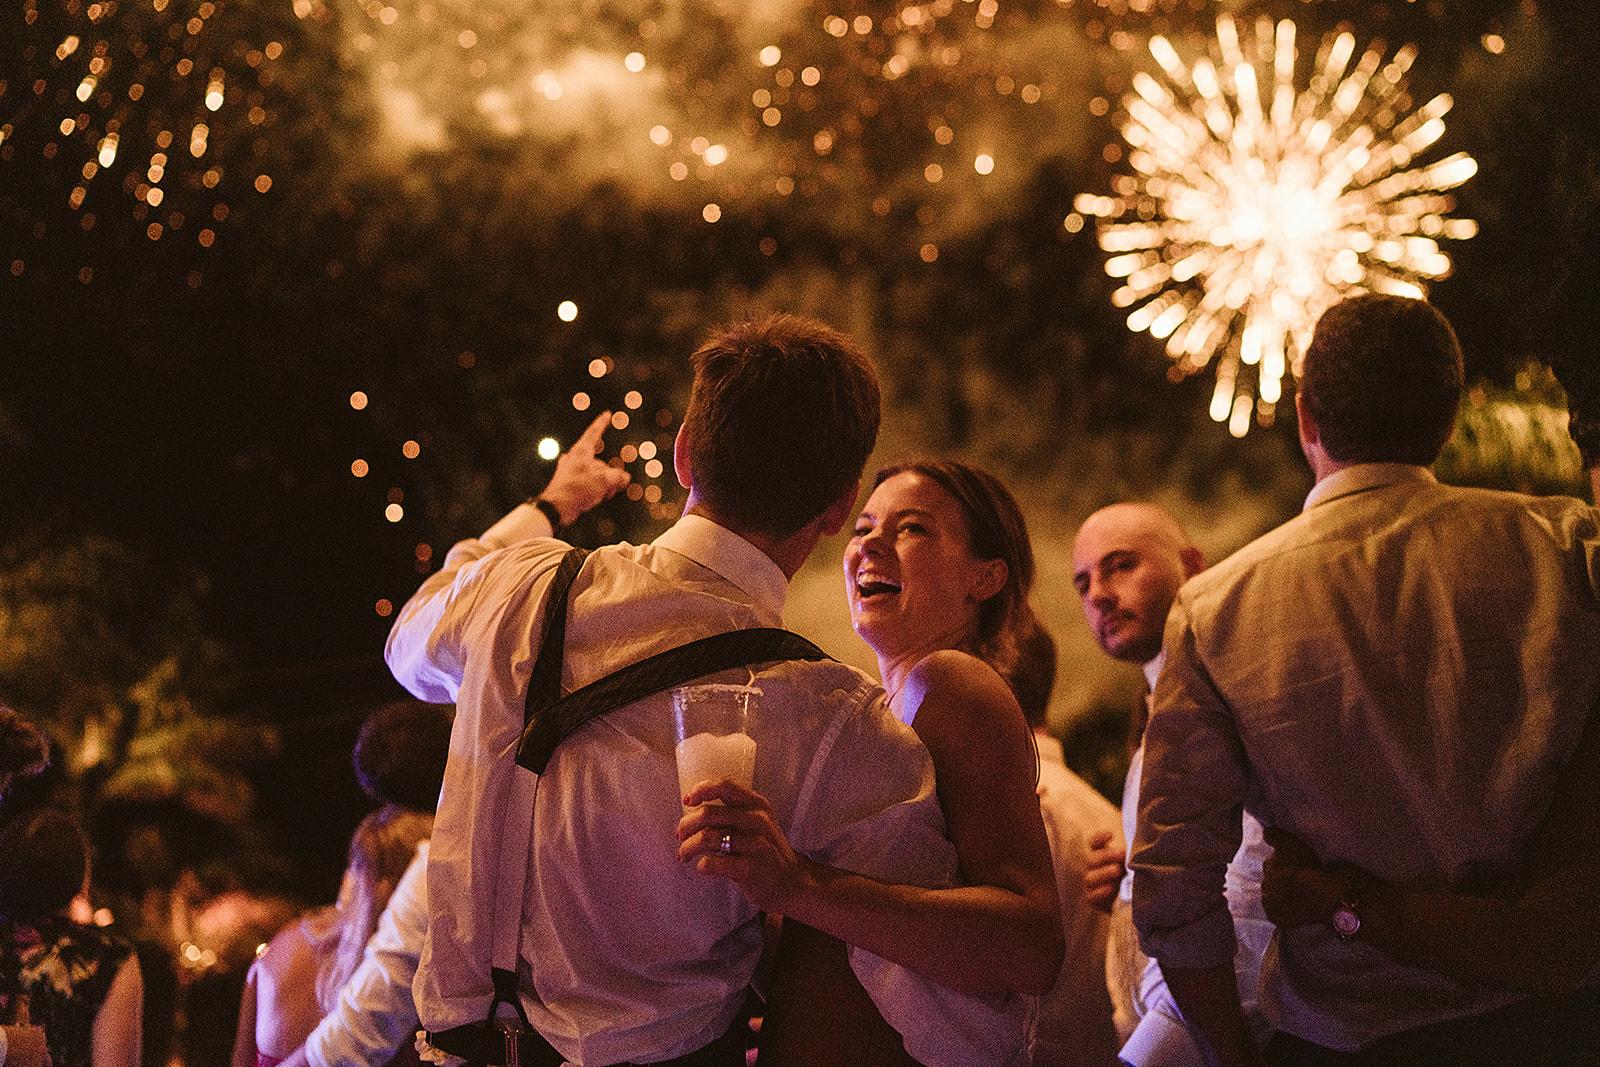 AmandaMarkus-Hacienda-Sac-Chich-Merida-Wedding-1027_websize.jpg